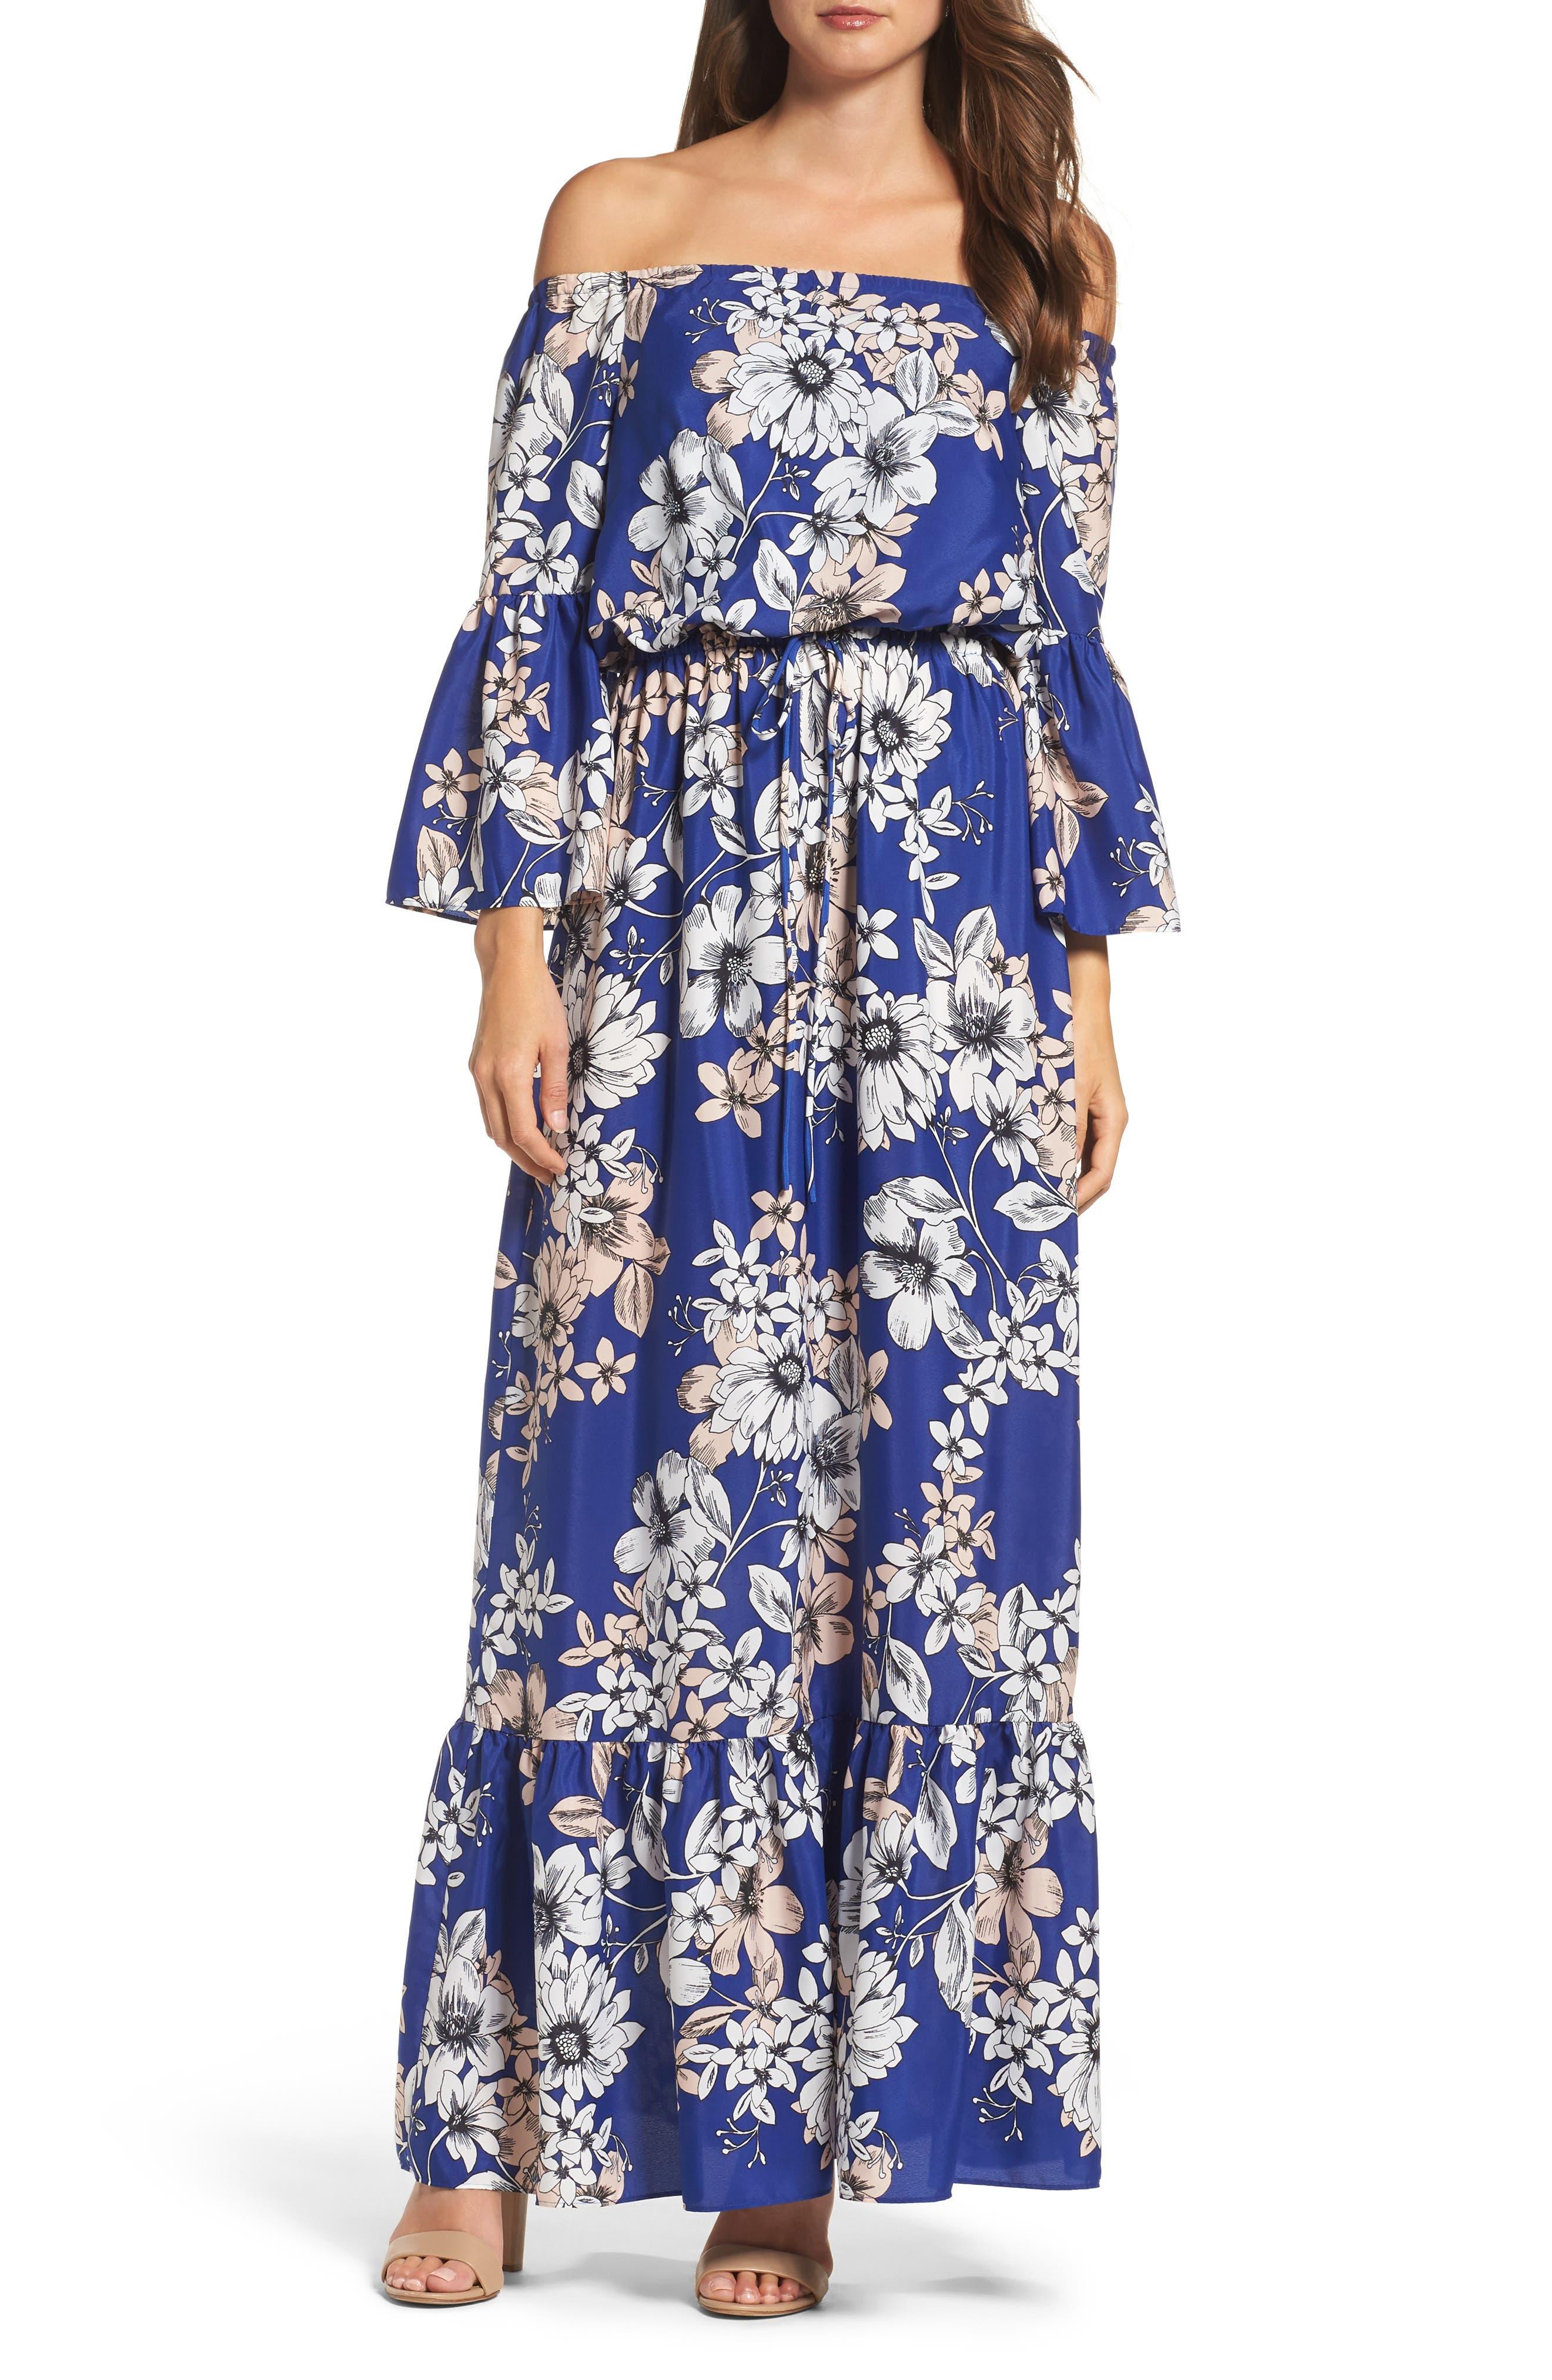 Off the Shoulder Floral Maxi Dress,                             Main thumbnail 1, color,                             COBALT